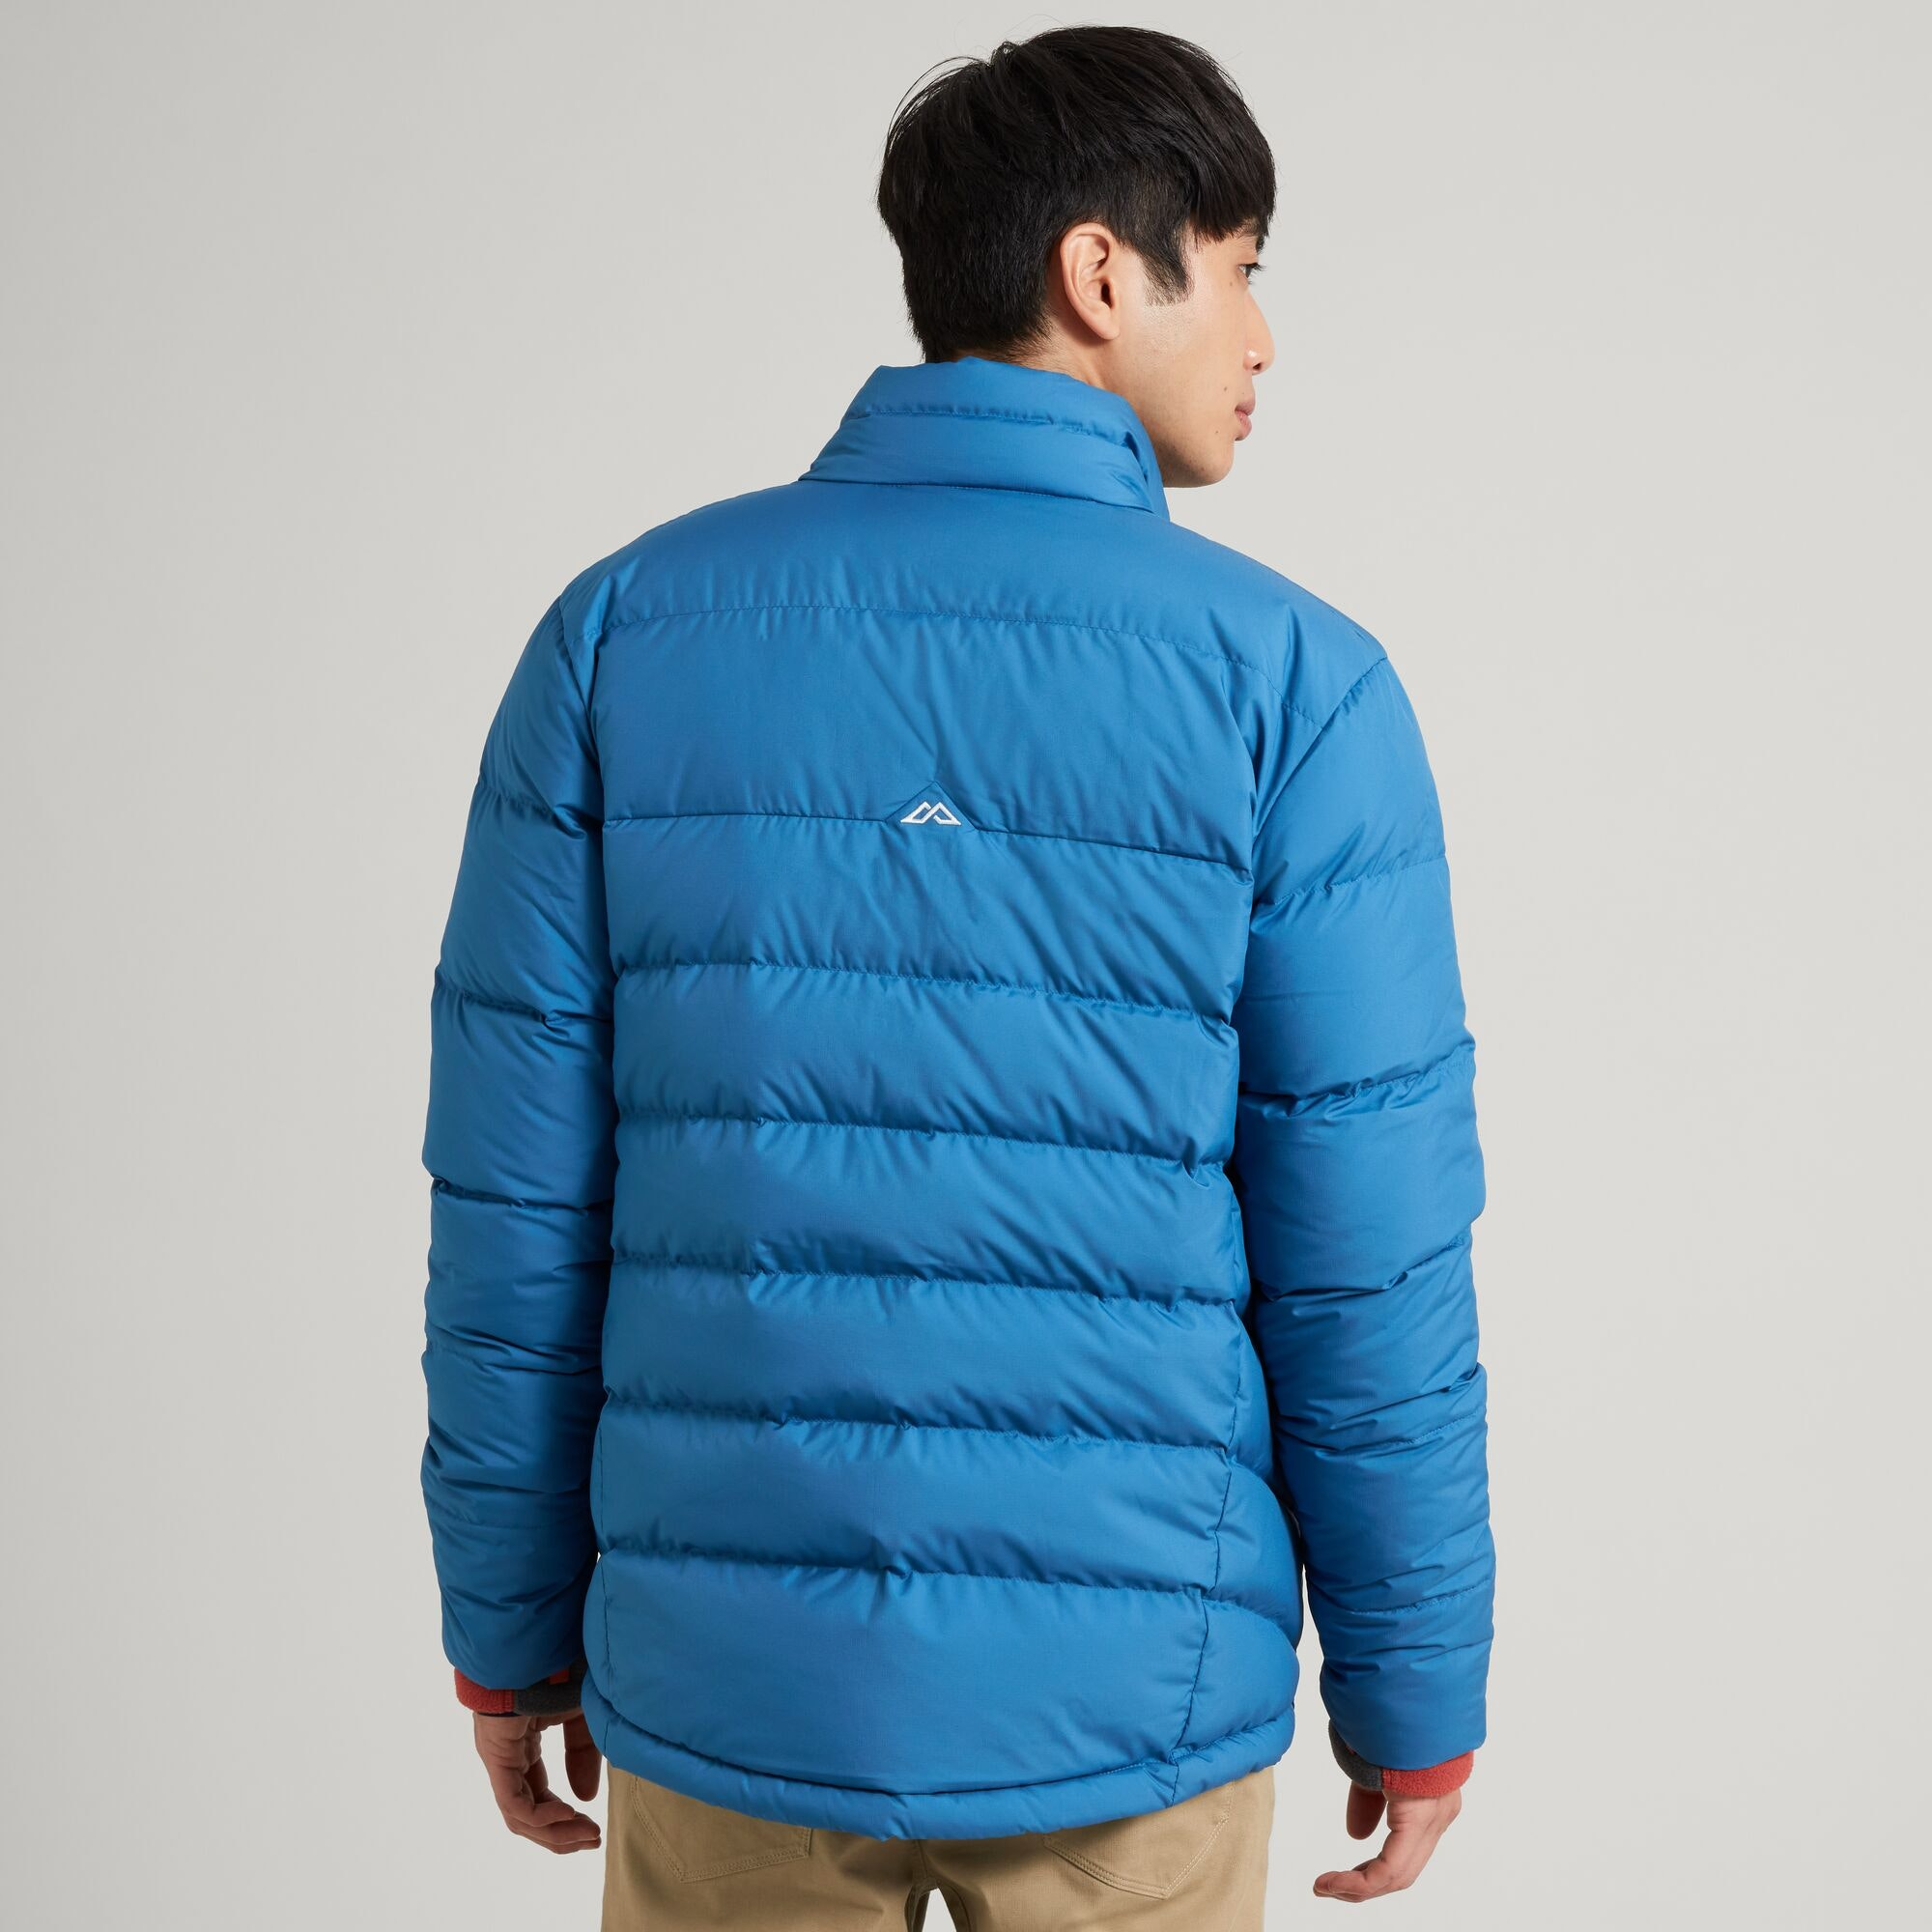 thumbnail 23 - NEW Kathmandu Epiq Mens 600 Fill Down Puffer Warm Outdoor Winter Jacket